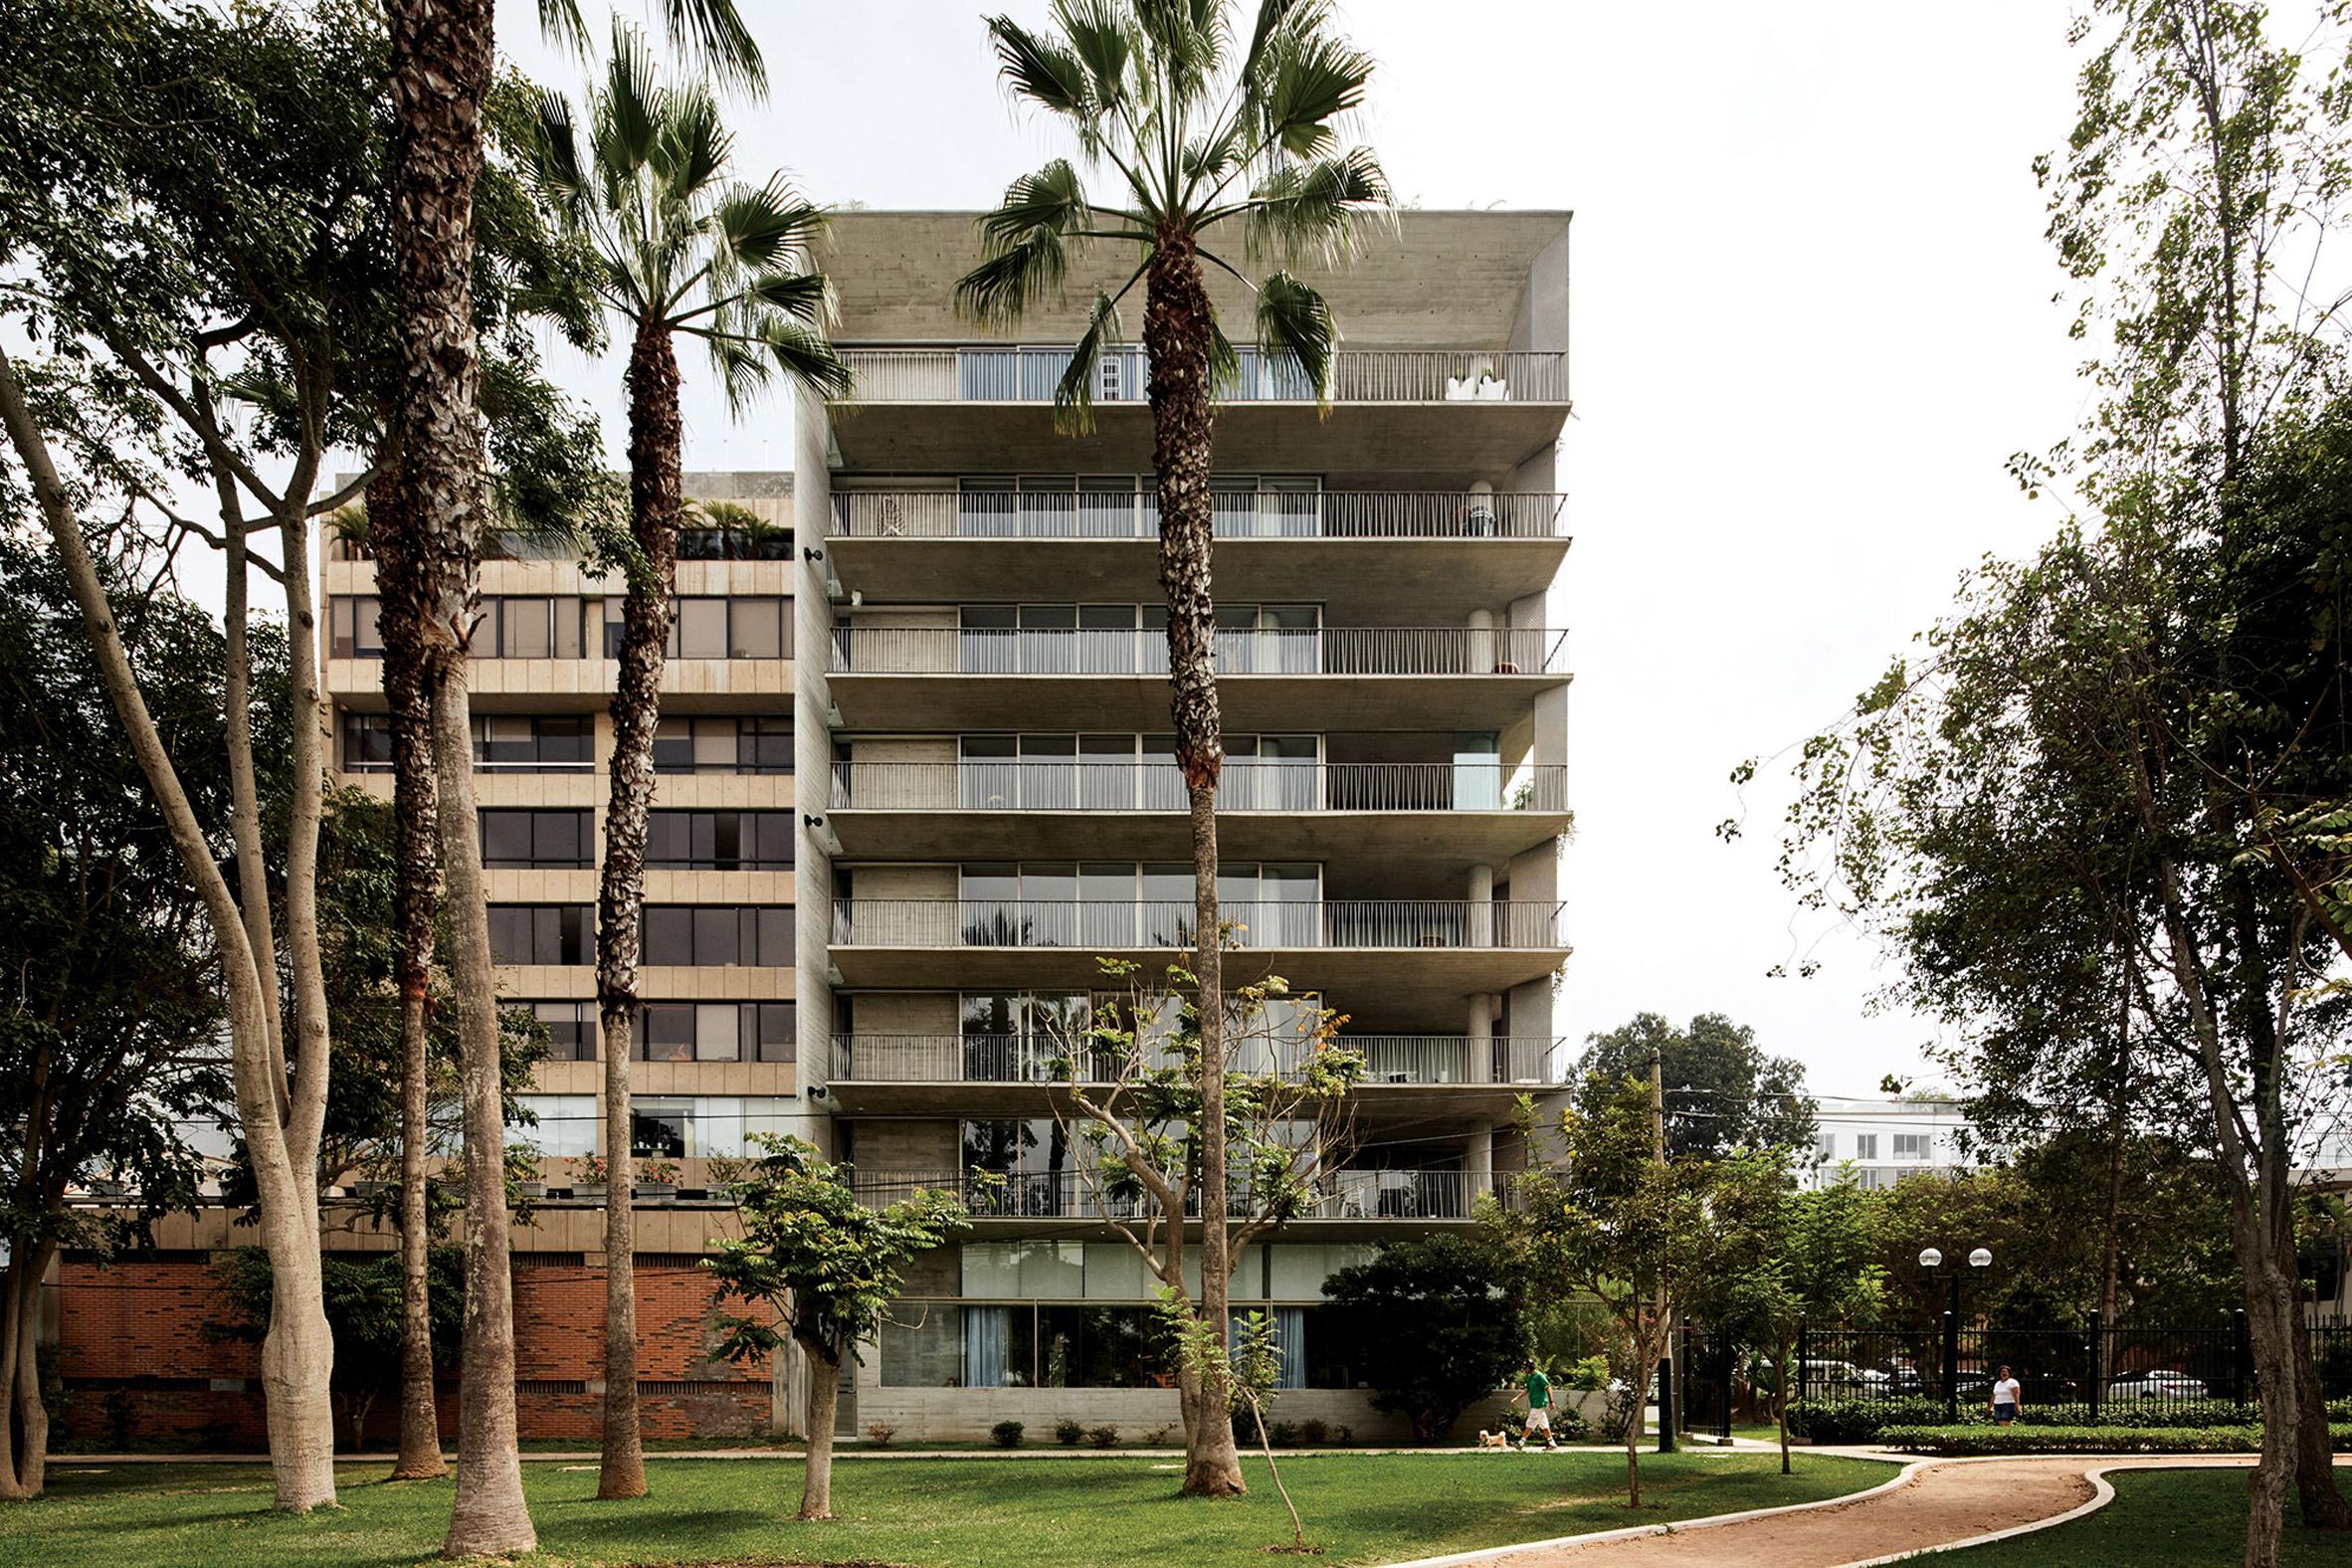 UN apartments by Barclay & Crousse